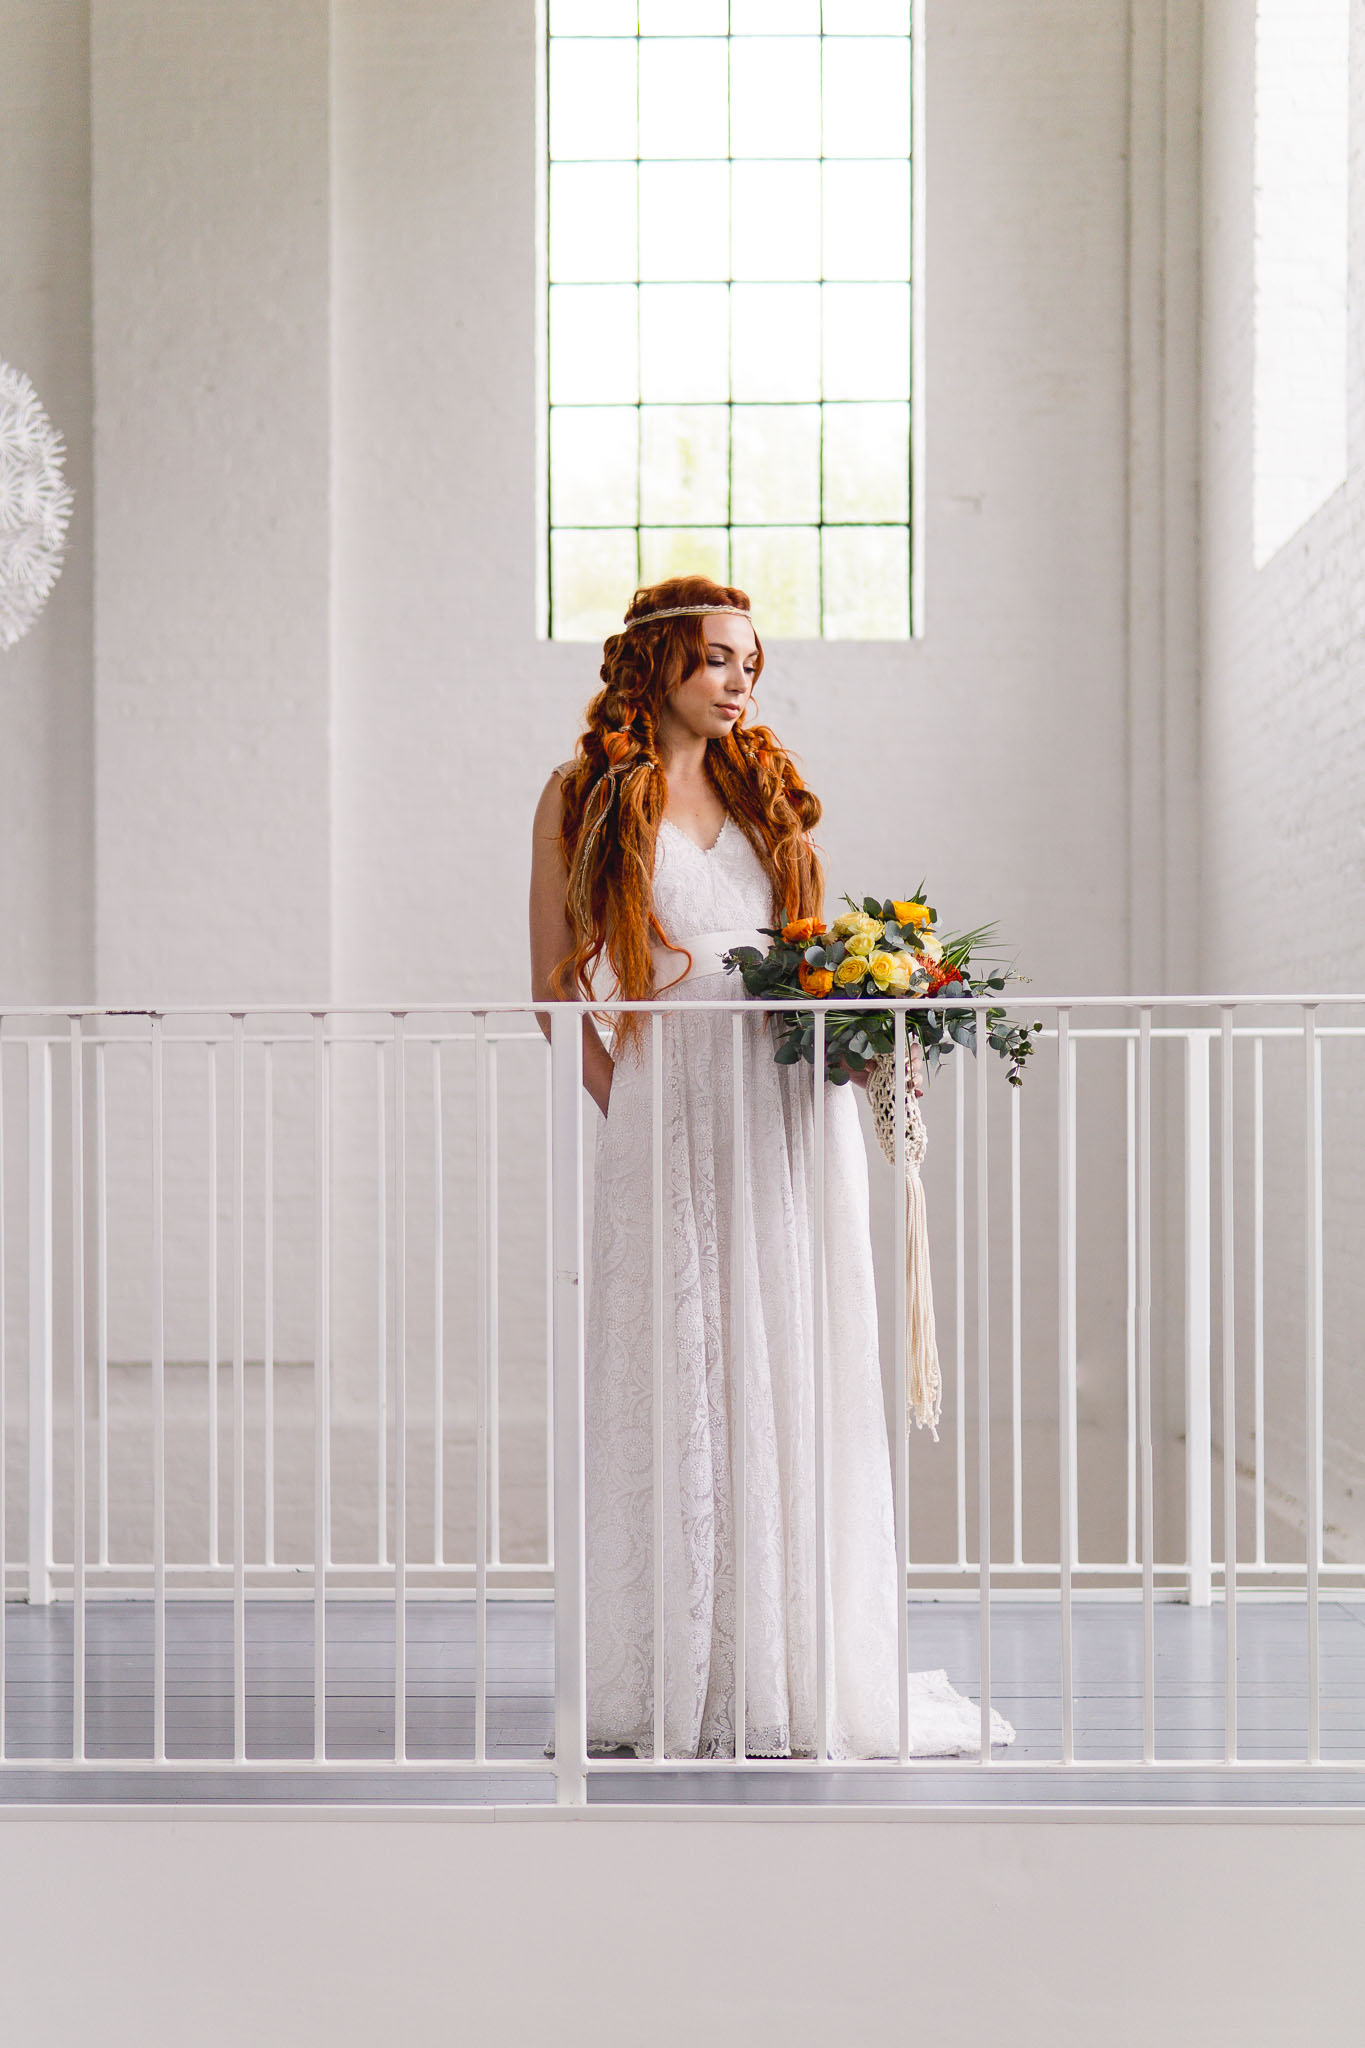 The_Conscious_Bride_Heline_Bekker_WEB_224.jpg